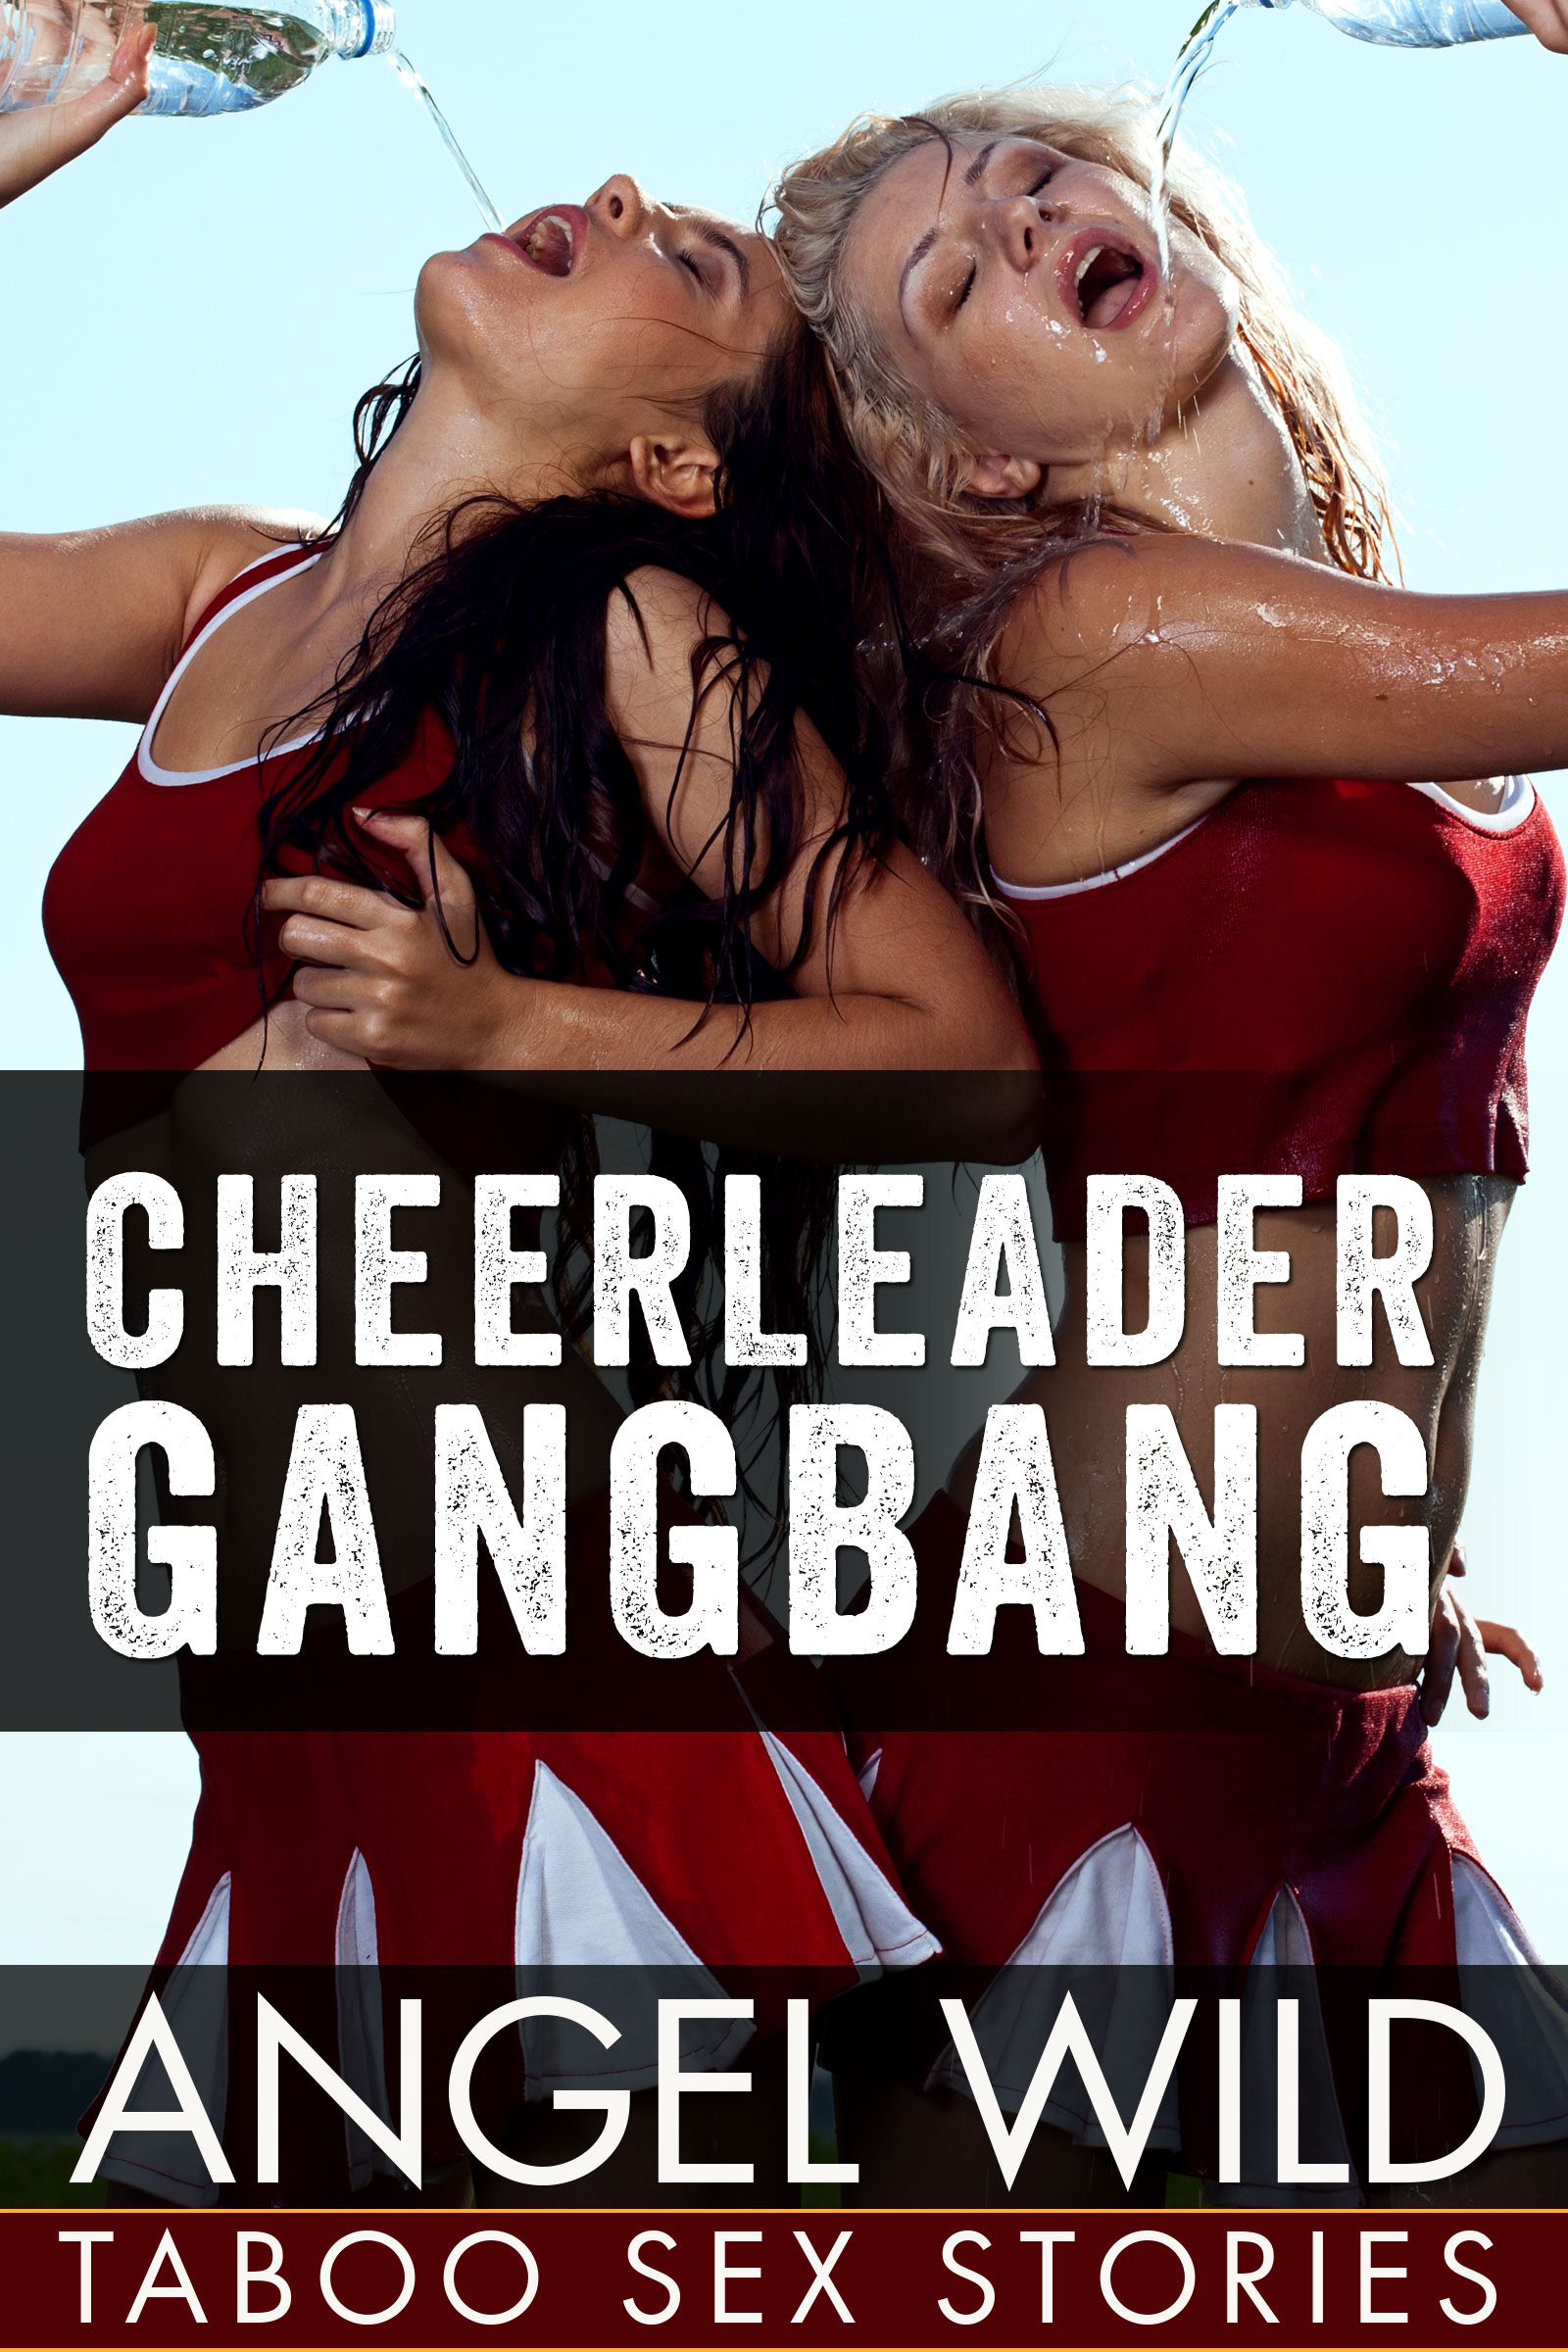 Cheerleader gangbang sories pics 999